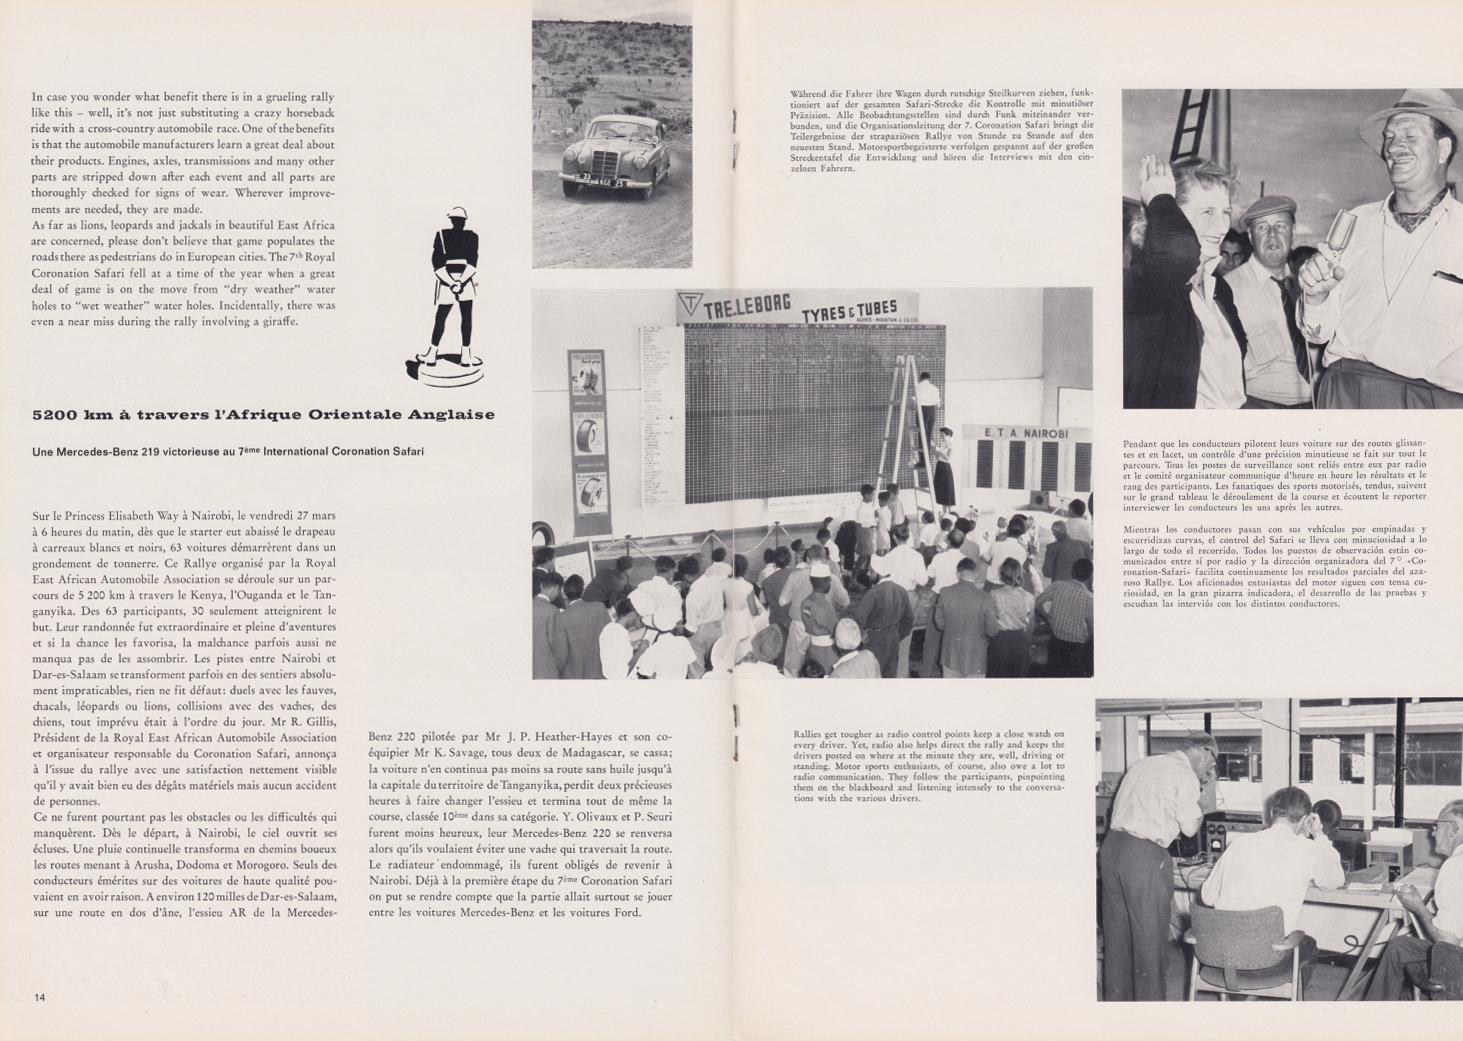 (REVISTA): Periódico In aller welt n.º 33 - Mercedes-Benz no mundo - 1959 - multilingue 008